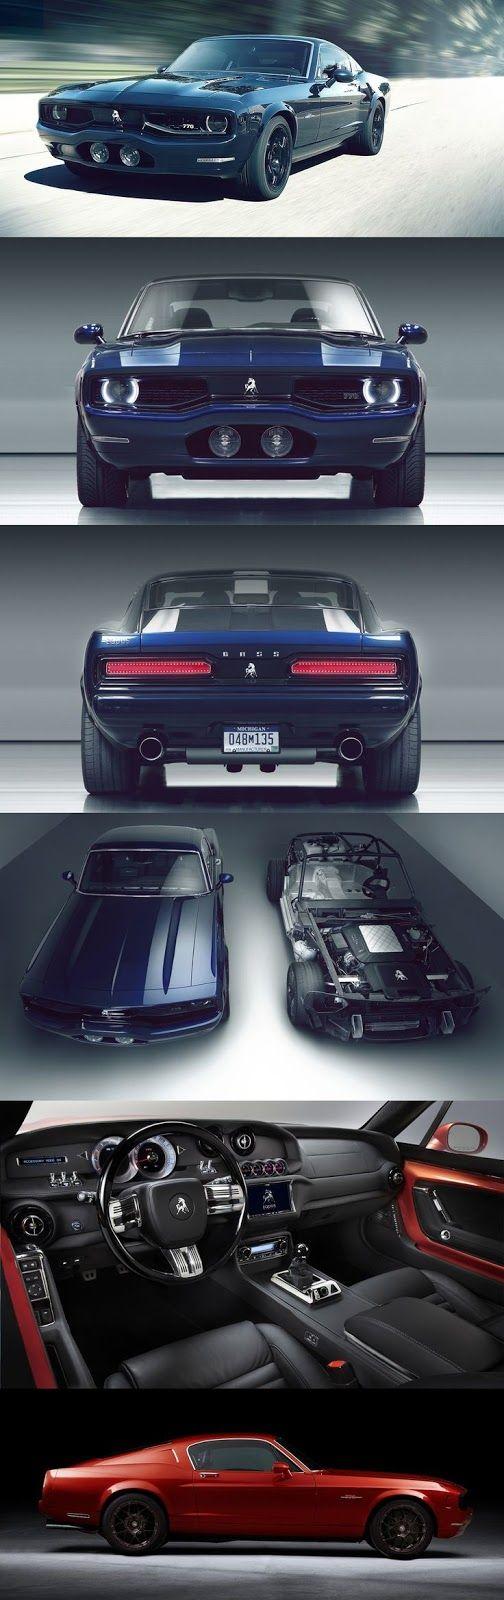 equus bass 770 the ridiculous 250 000 muscle car pinterest. Black Bedroom Furniture Sets. Home Design Ideas